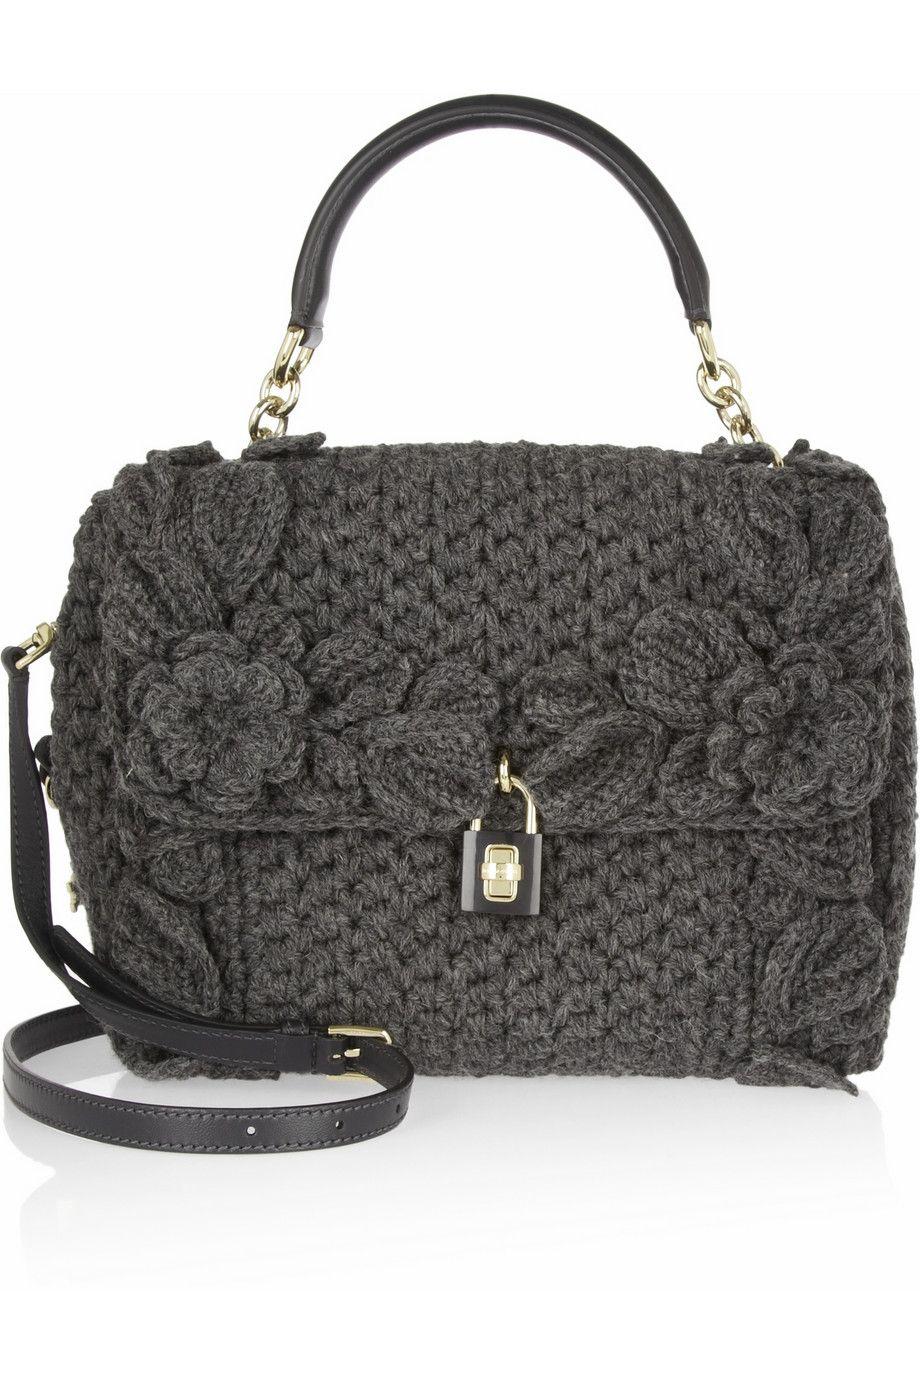 Shoulder bag Handbag Nylon leather handle black Dolce & Gabbana dwSTv